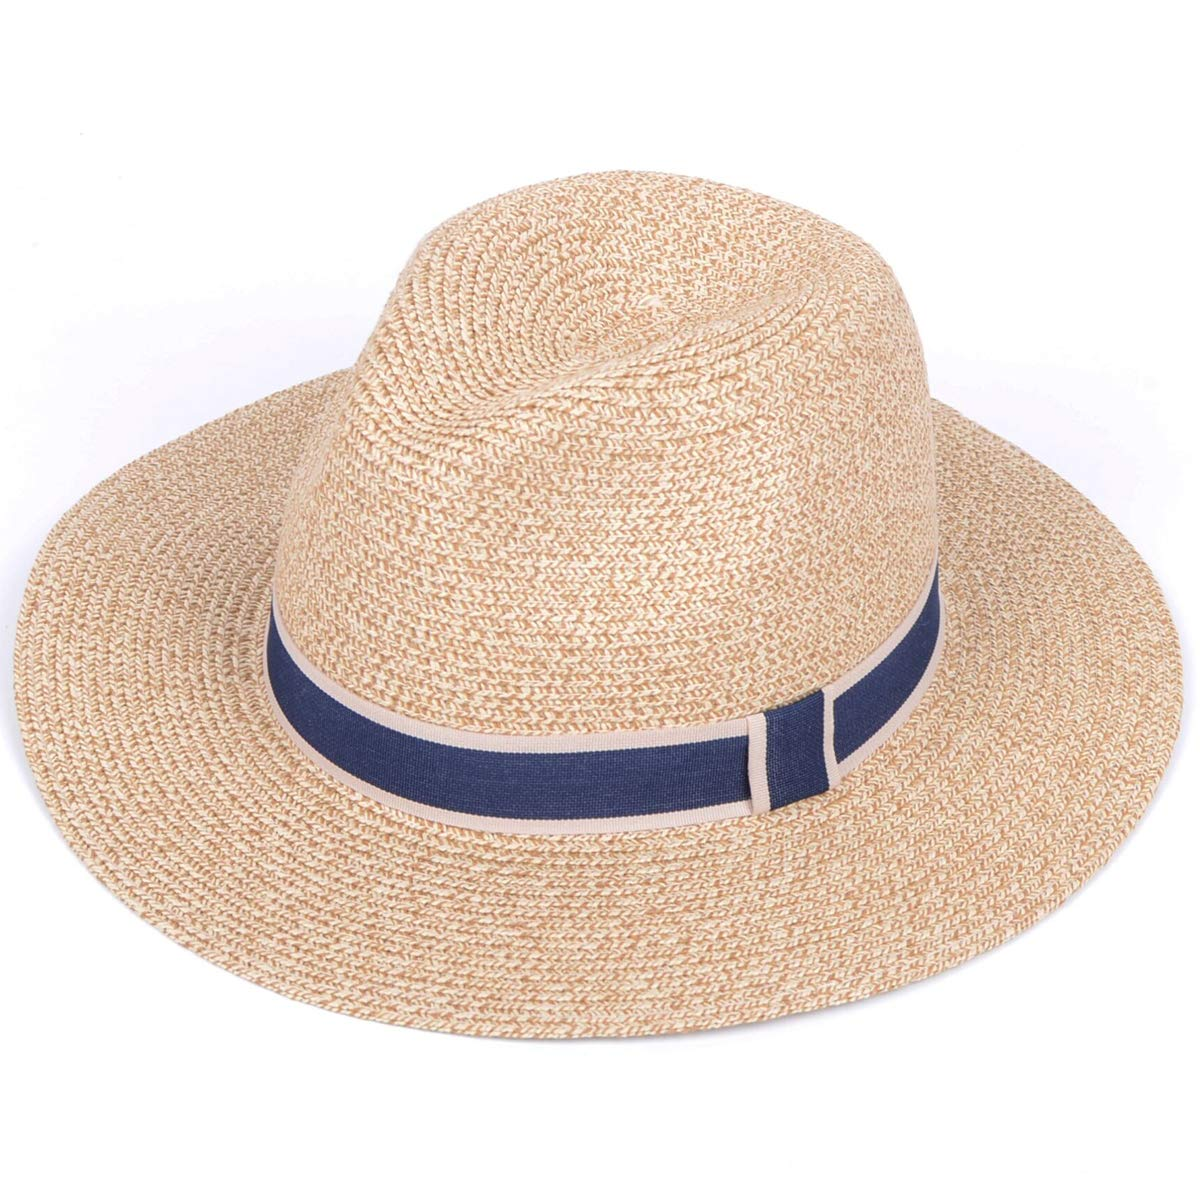 Lanzom Women Wide Brim Straw Panama Roll up Hat Fedora Beach Sun Hat UPF50+ (Y-Beige)